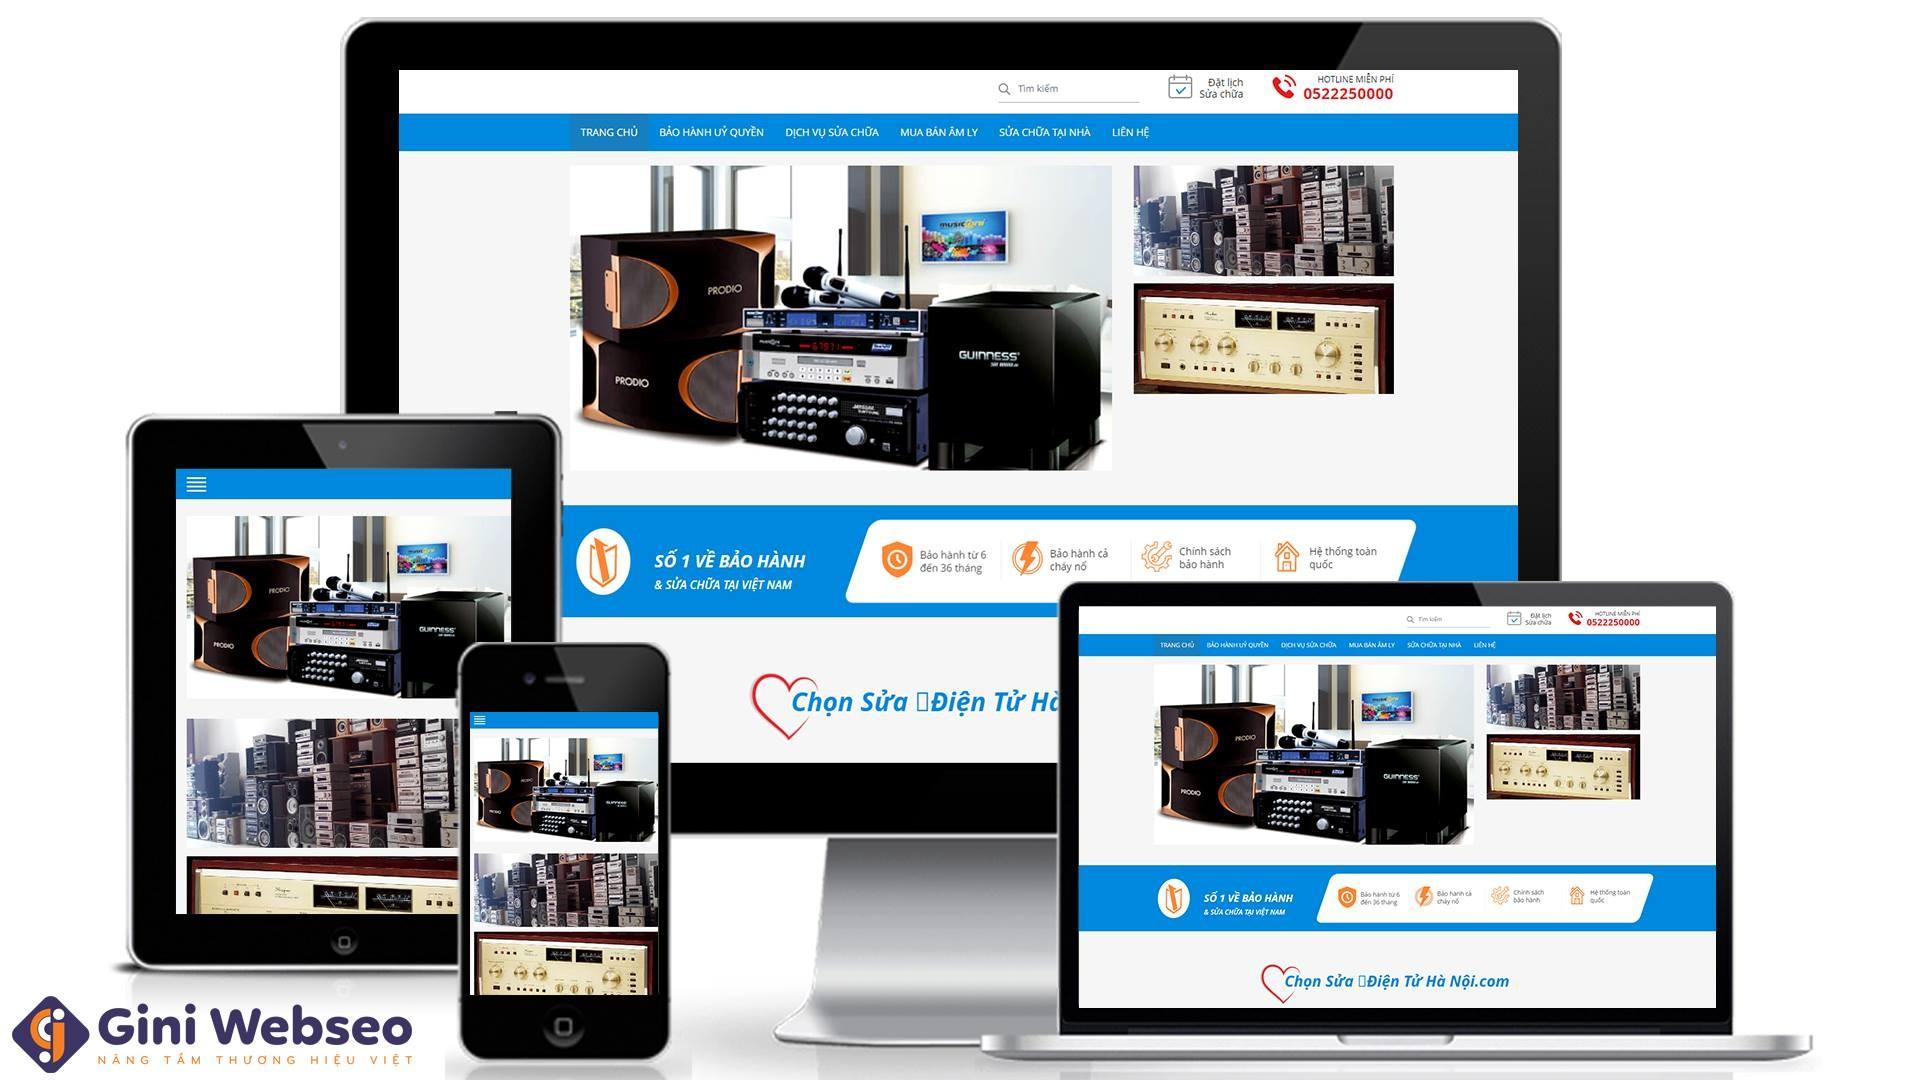 Thiết kế website Sửa chữa laptop 24h.com